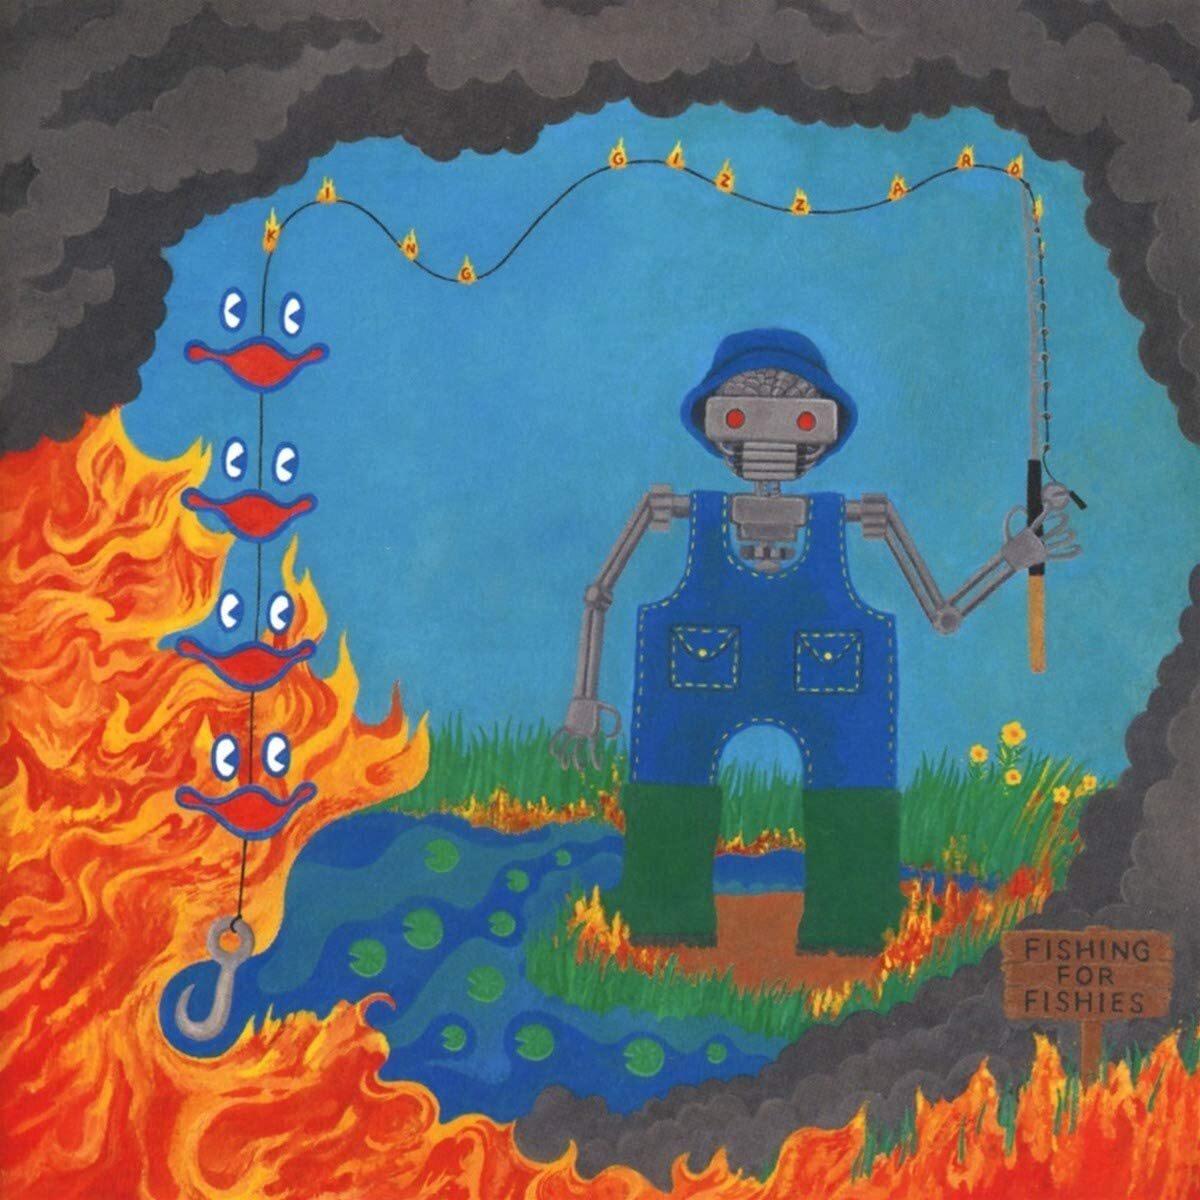 King Gizzard & the Lizard - Fishing For Fishies (LP)